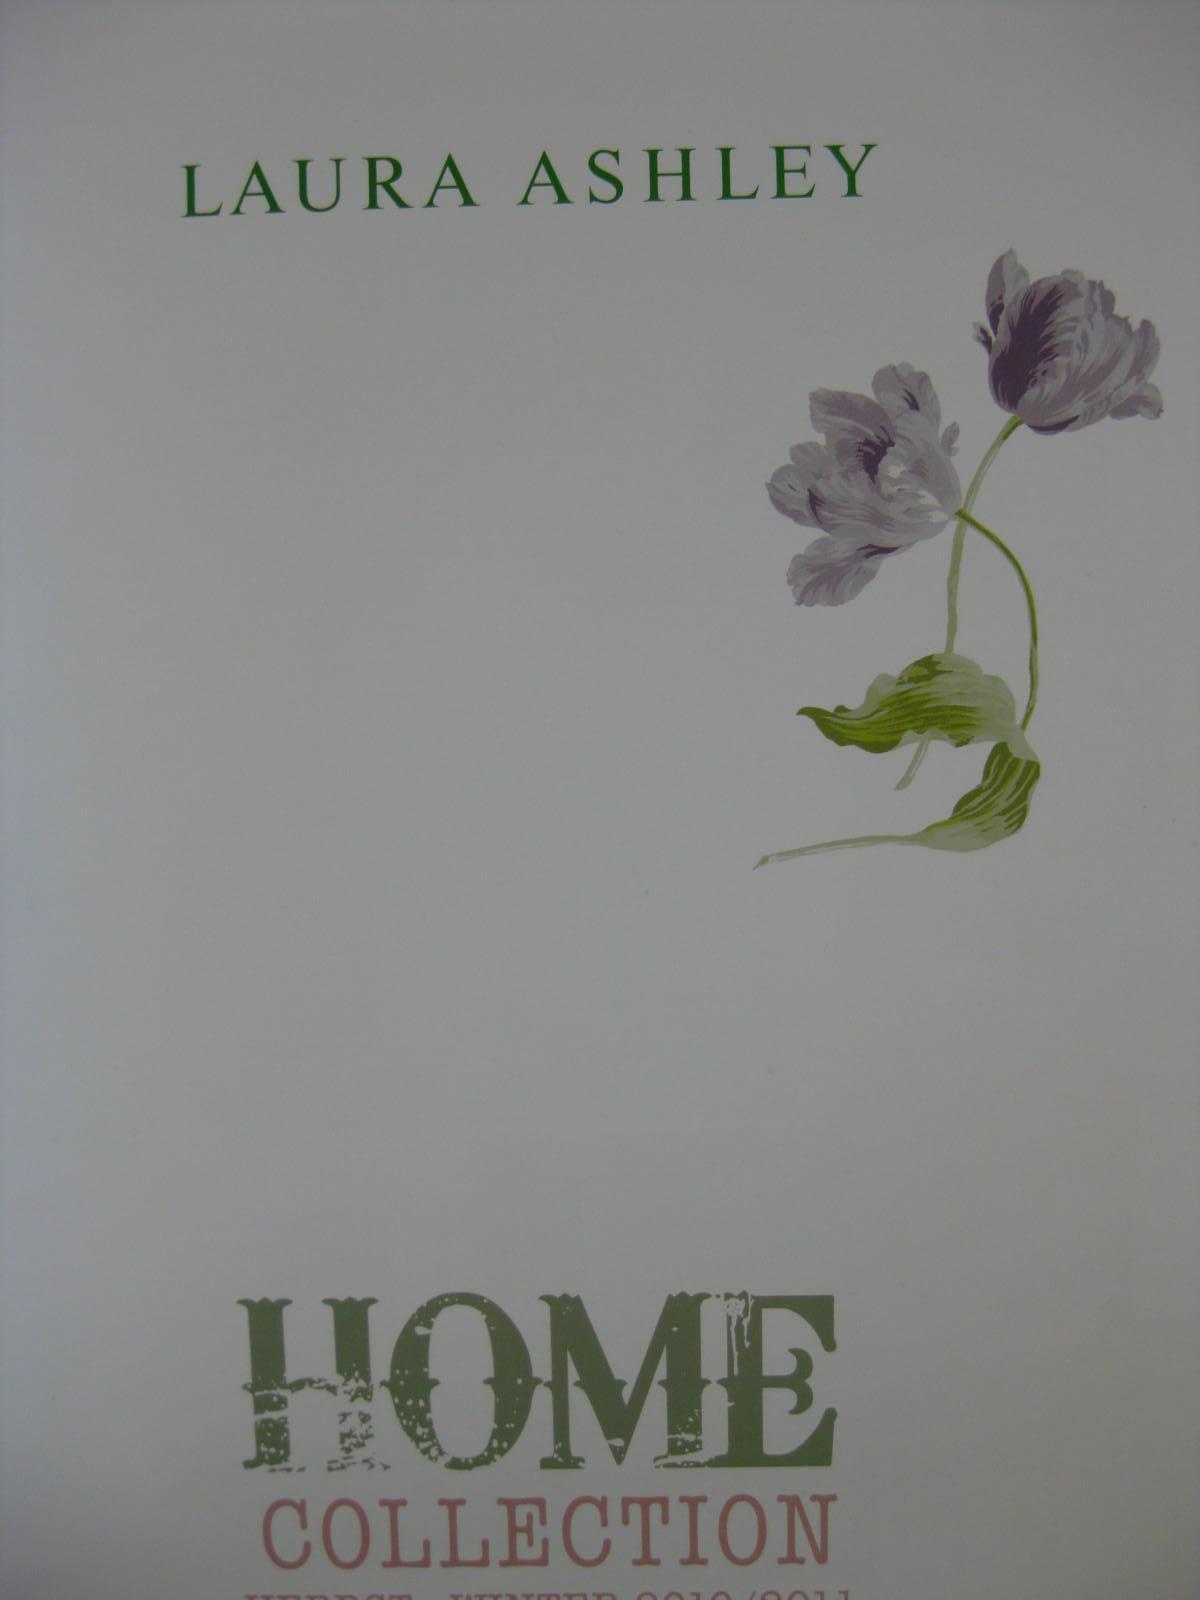 tagesdecke lakerton amethyst v8 von laura ashley 240x265. Black Bedroom Furniture Sets. Home Design Ideas